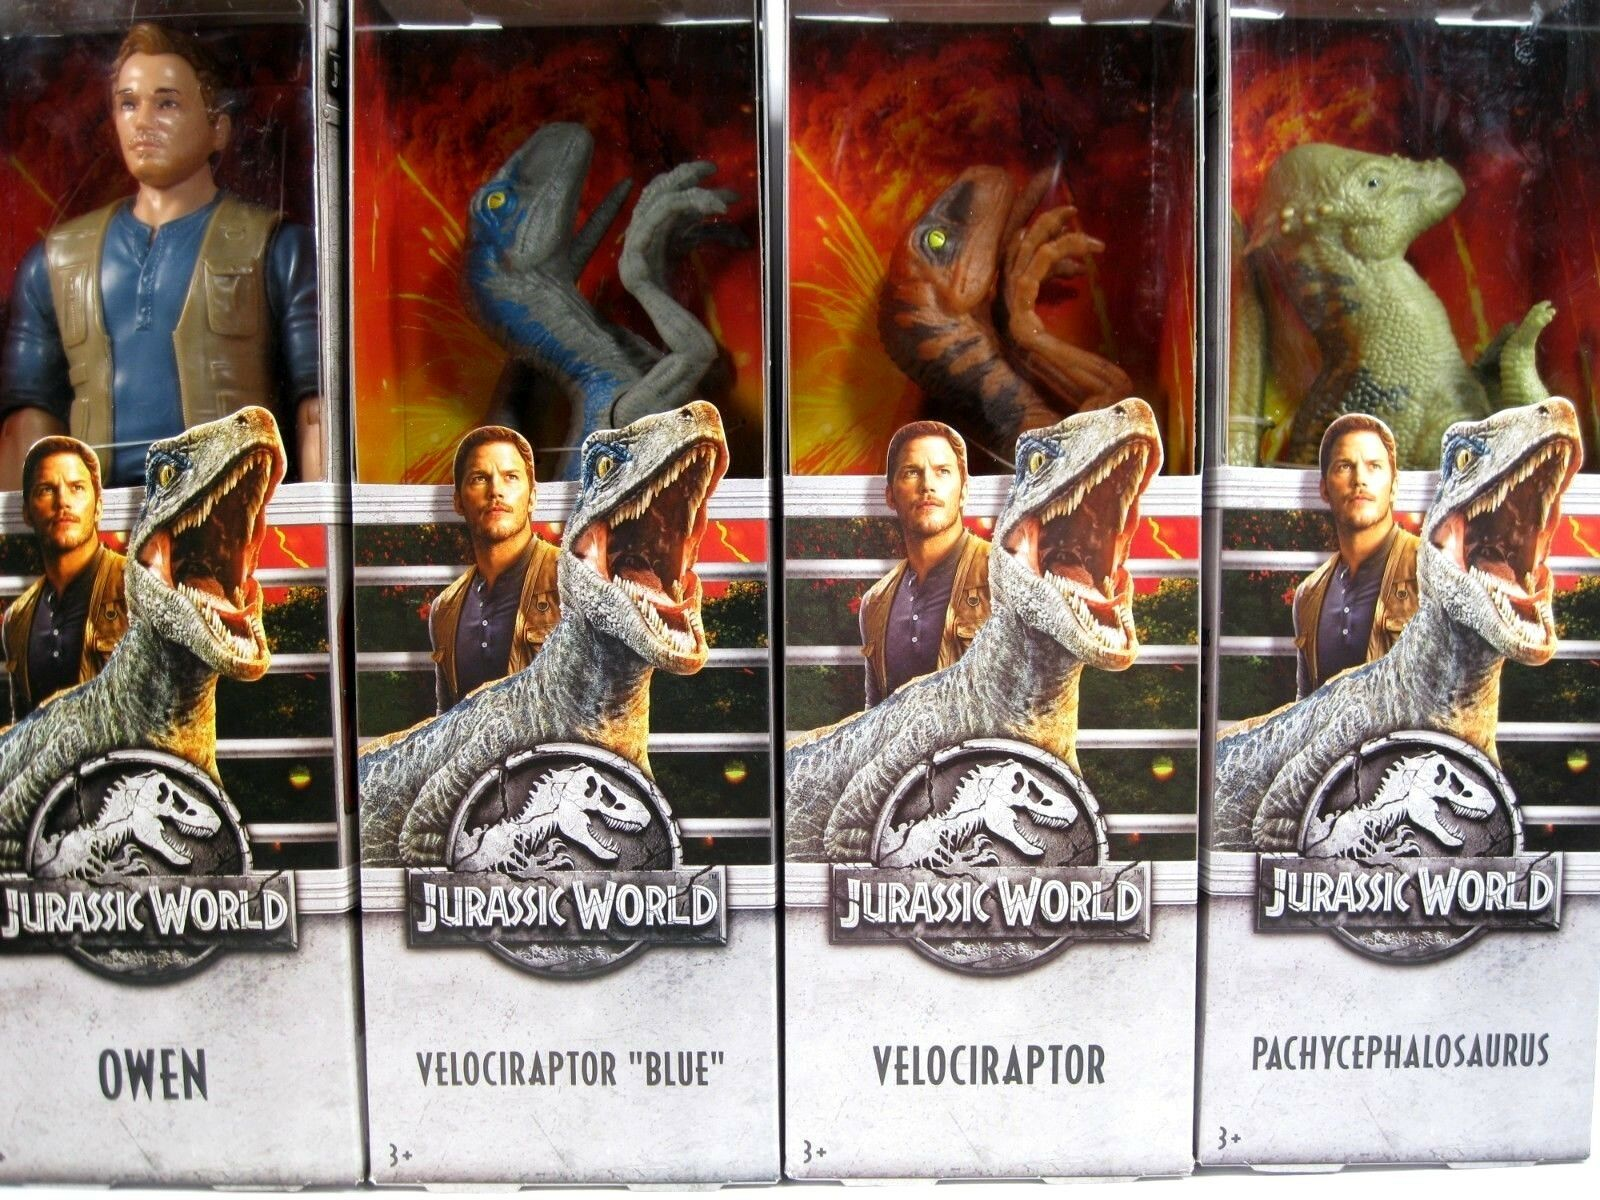 Jurassic World 4x Figure OWEN VELOCIRAPTOR Blau pachycephalosaurus dinosaur set